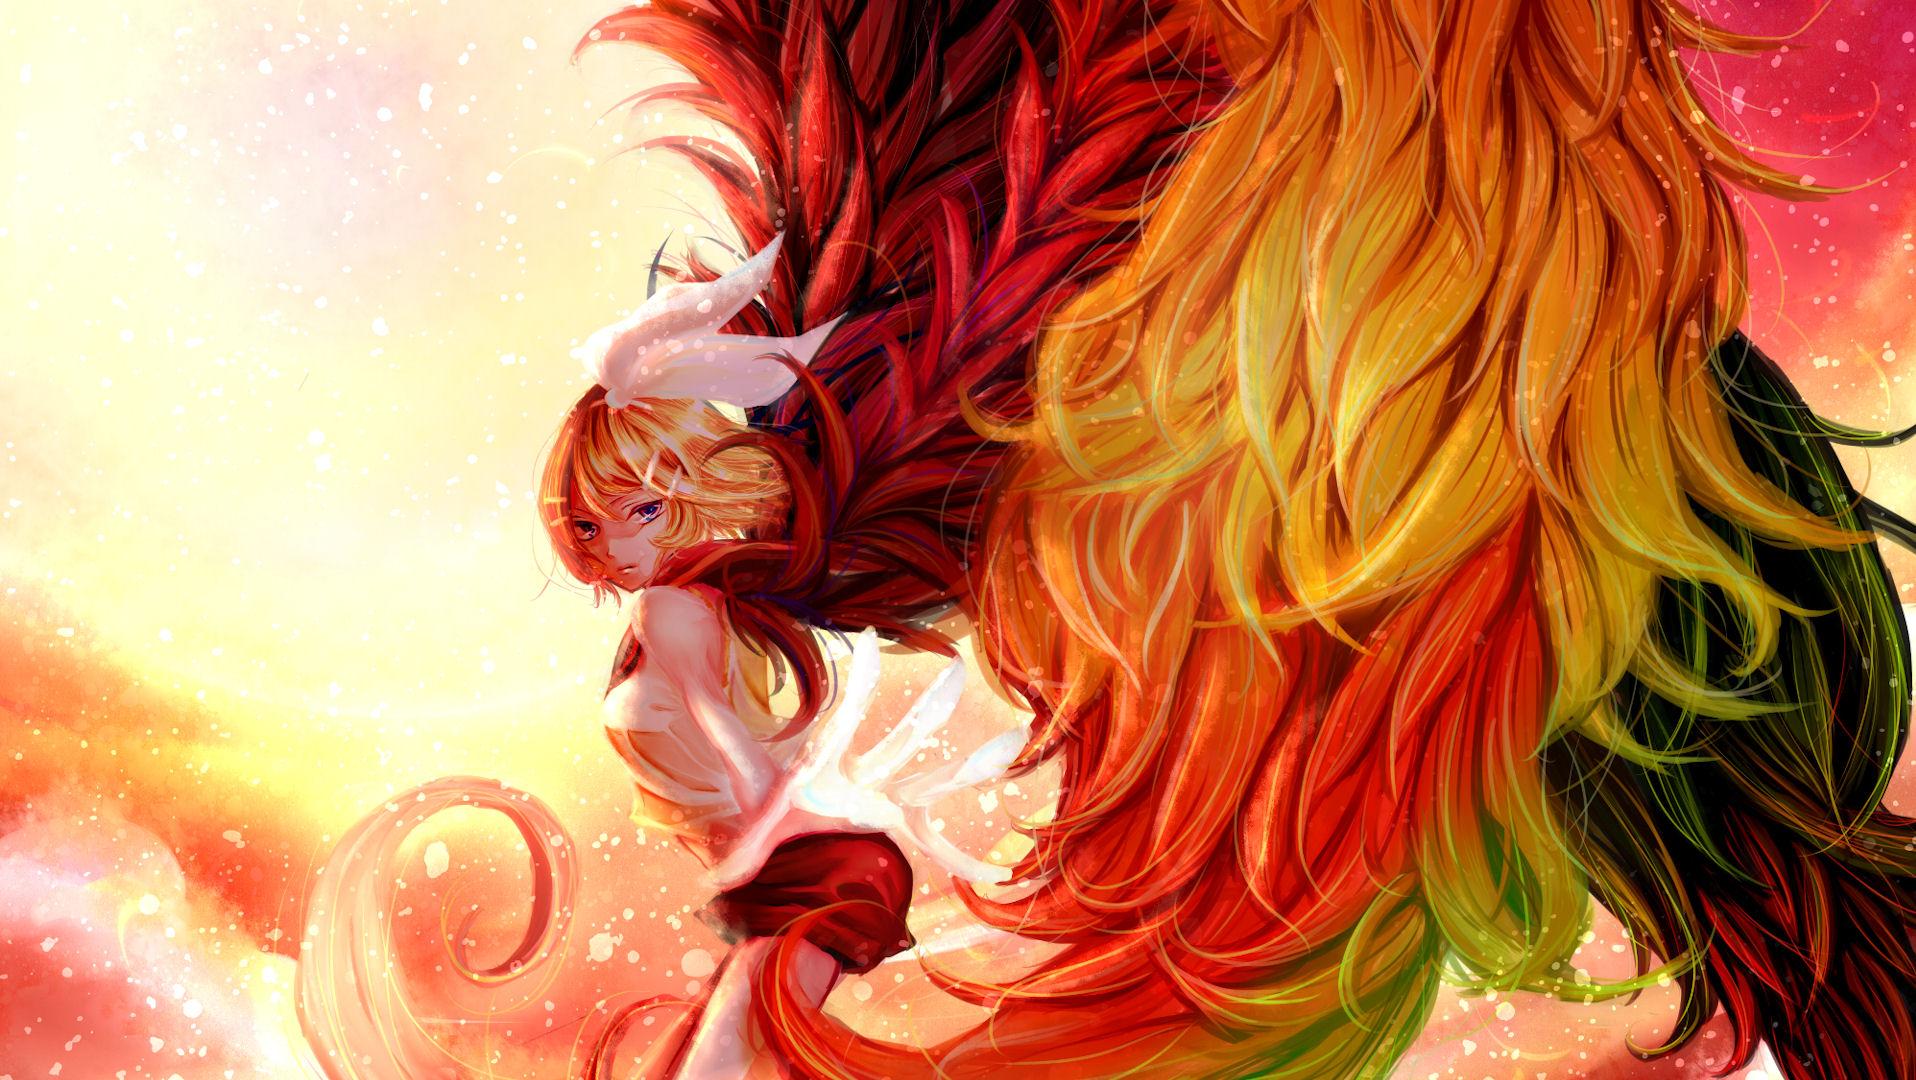 Rin Kagamine Wings Girl 1916x1080